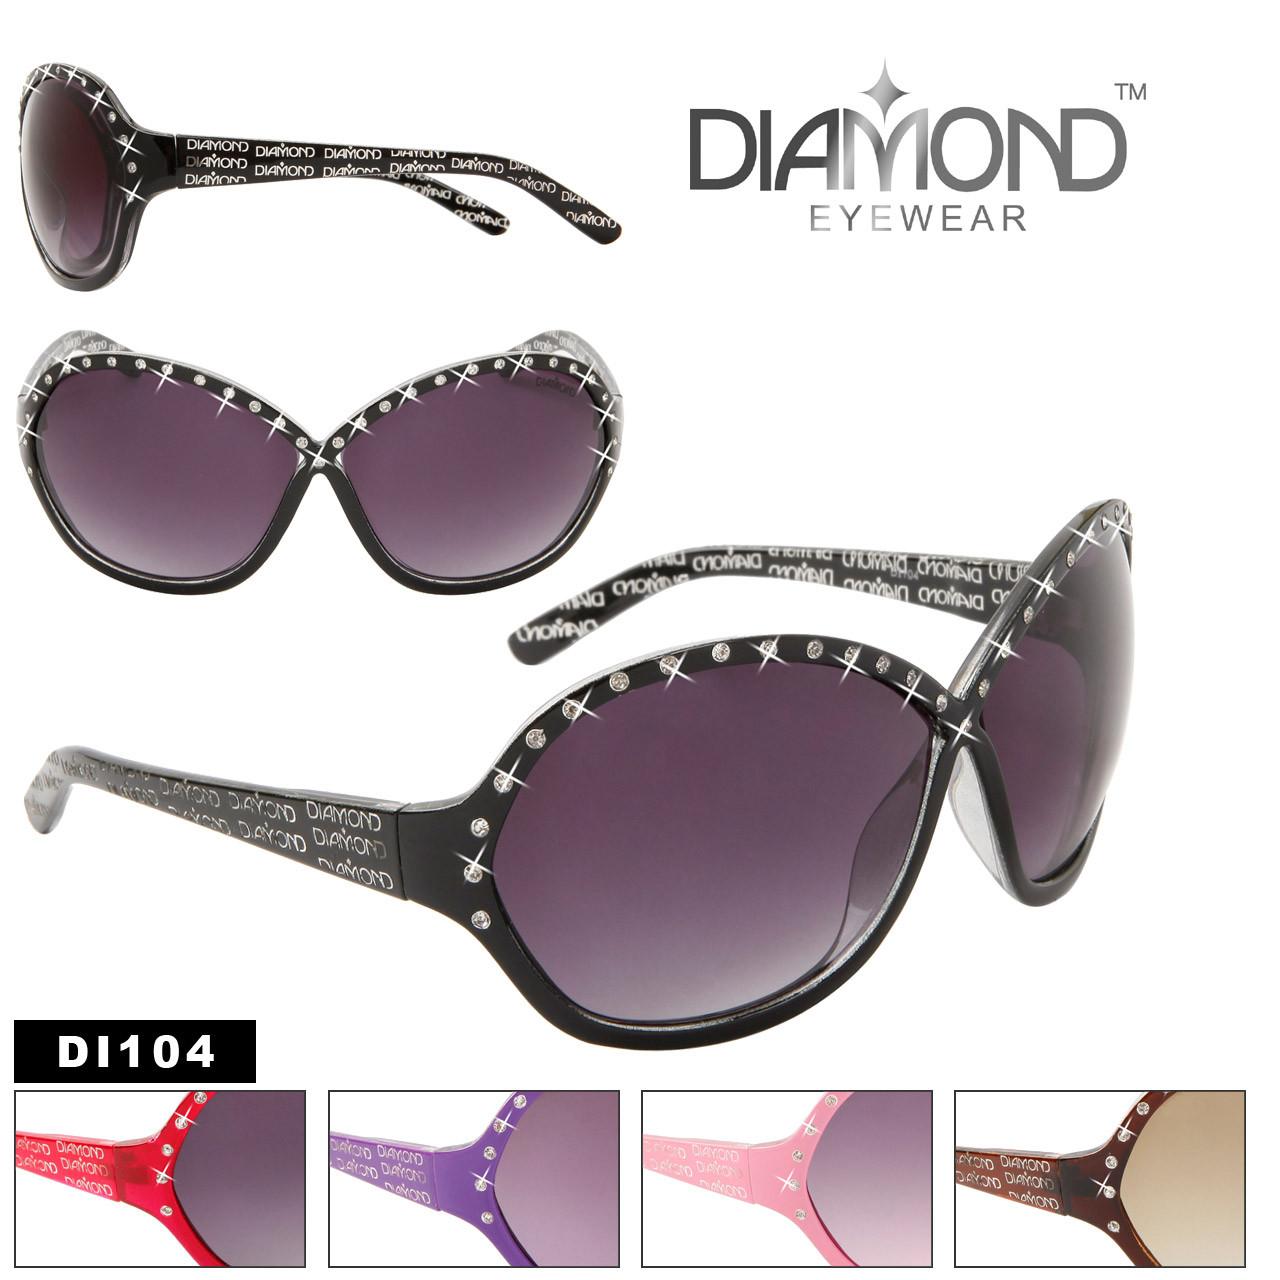 Ladies Fashion Sunglasses DI104 Diamond Eyewear™ (Assorted Colors) (12 pcs.)